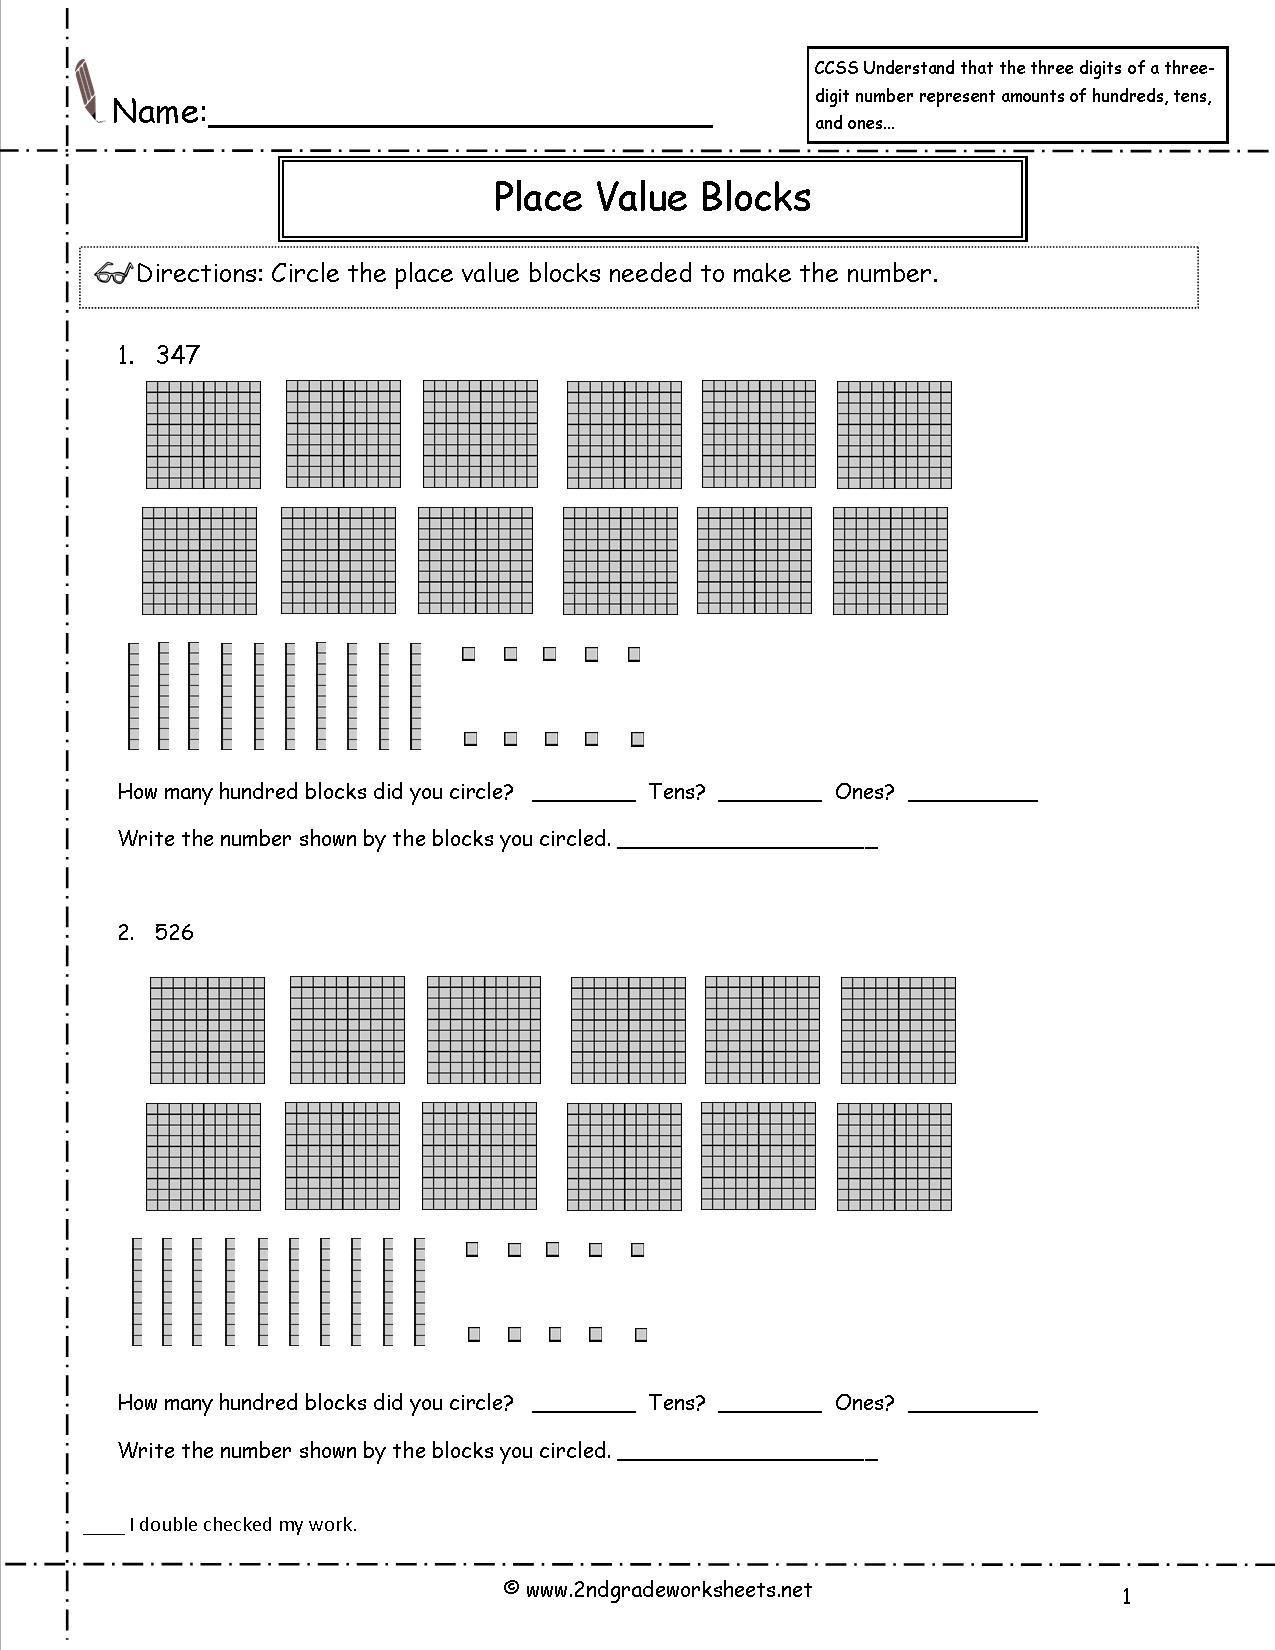 Ccss 2nbt1 Worksheets Place Value Worksheets